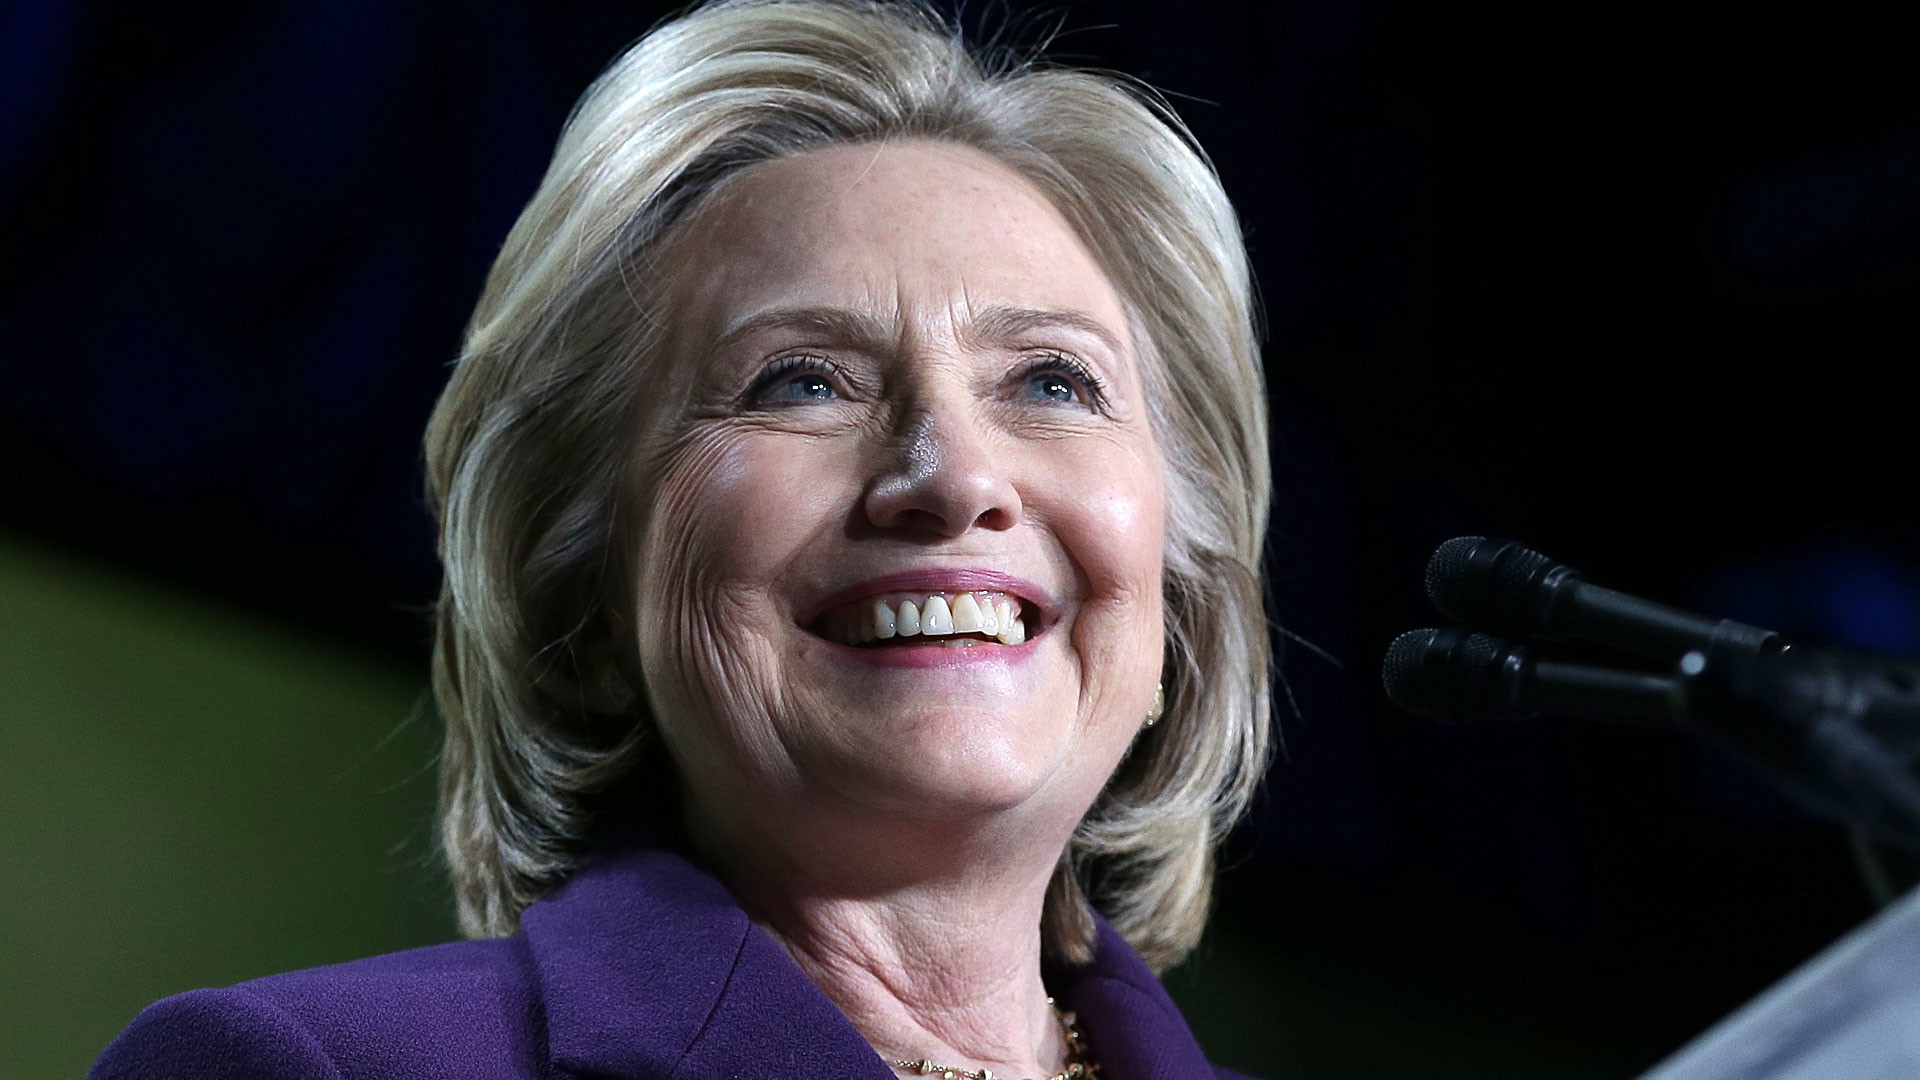 Hillary Clinton Wallpaper HD.